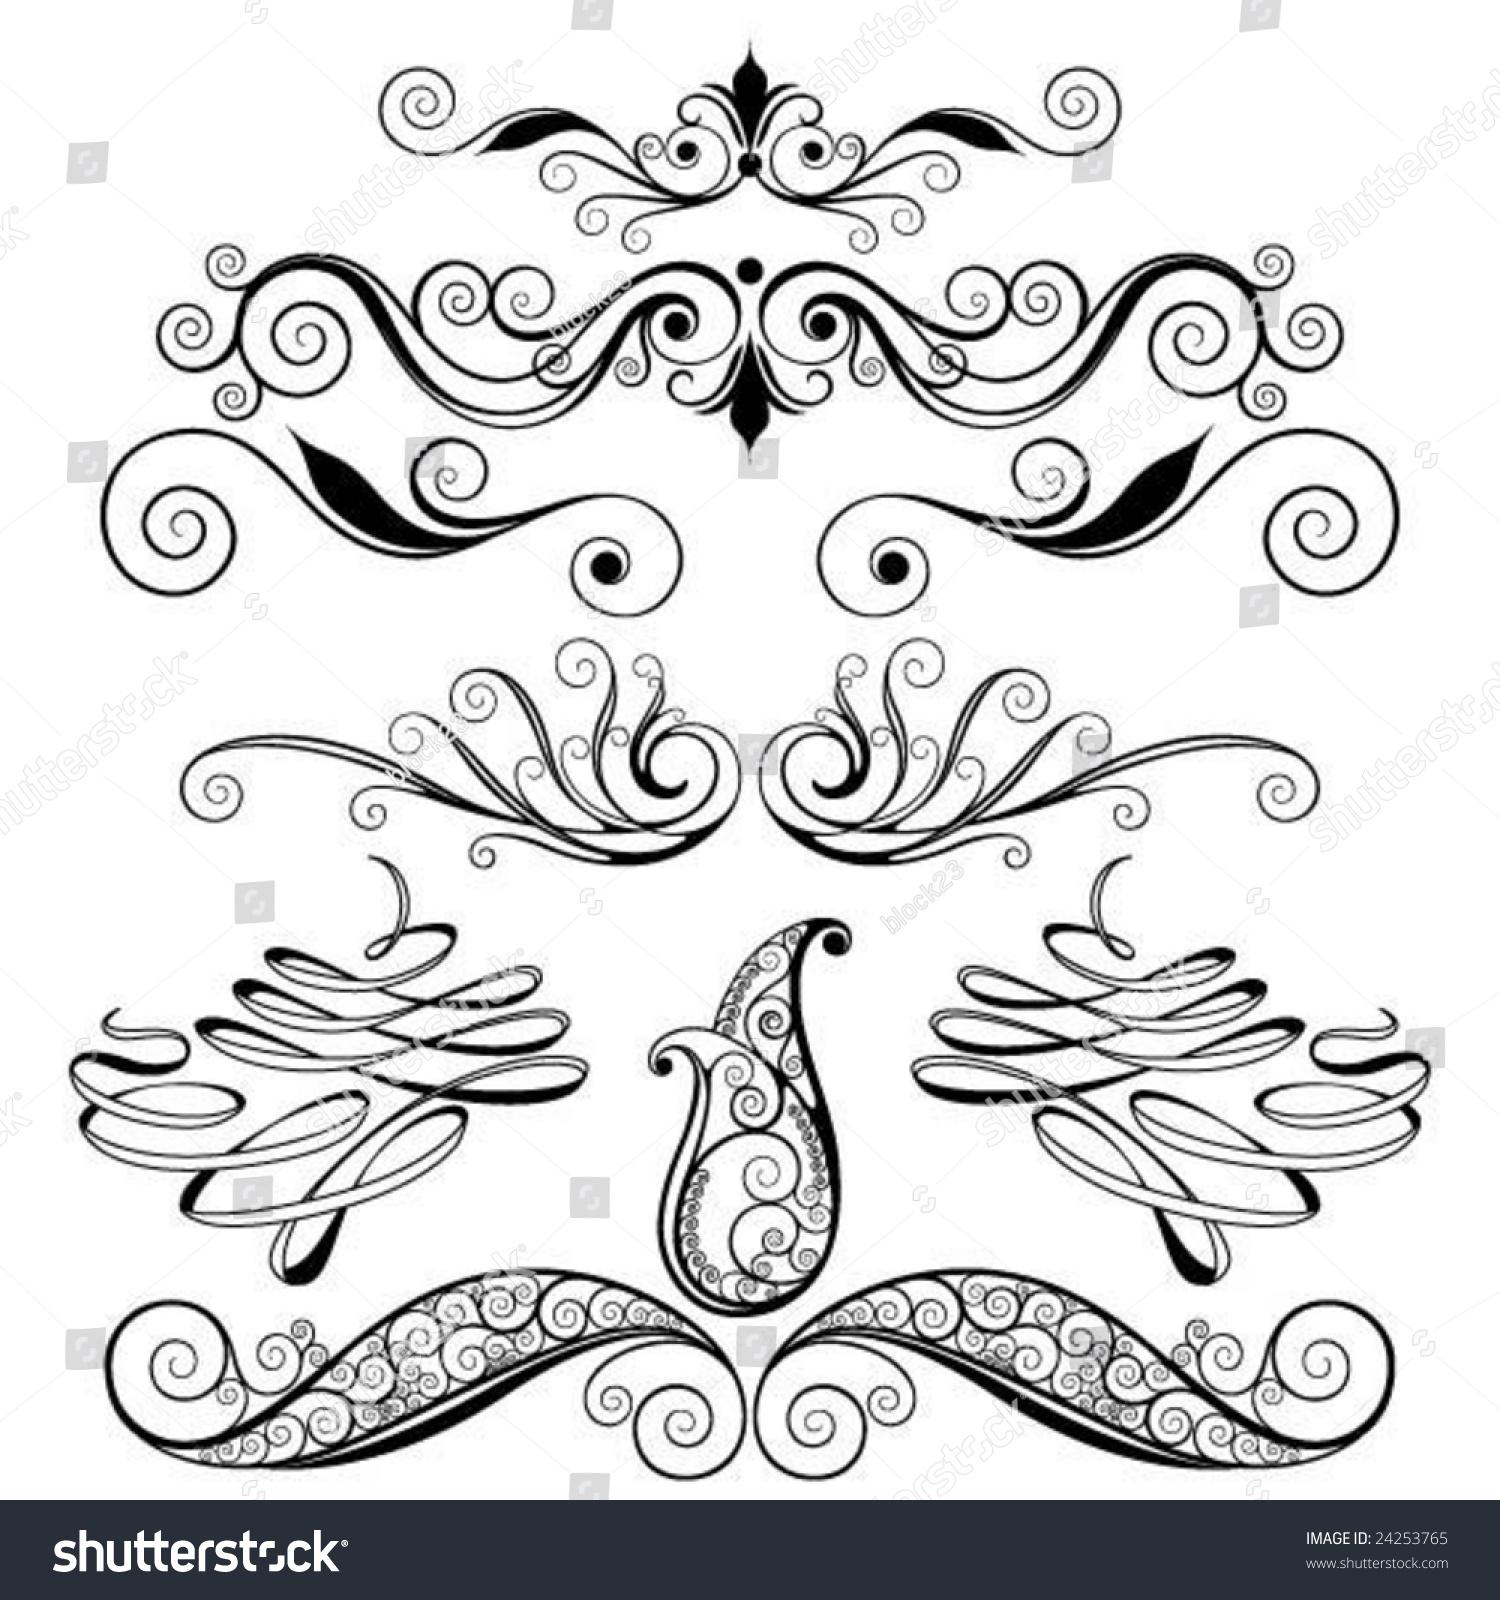 Decorative Line Clipart Panda Free Images